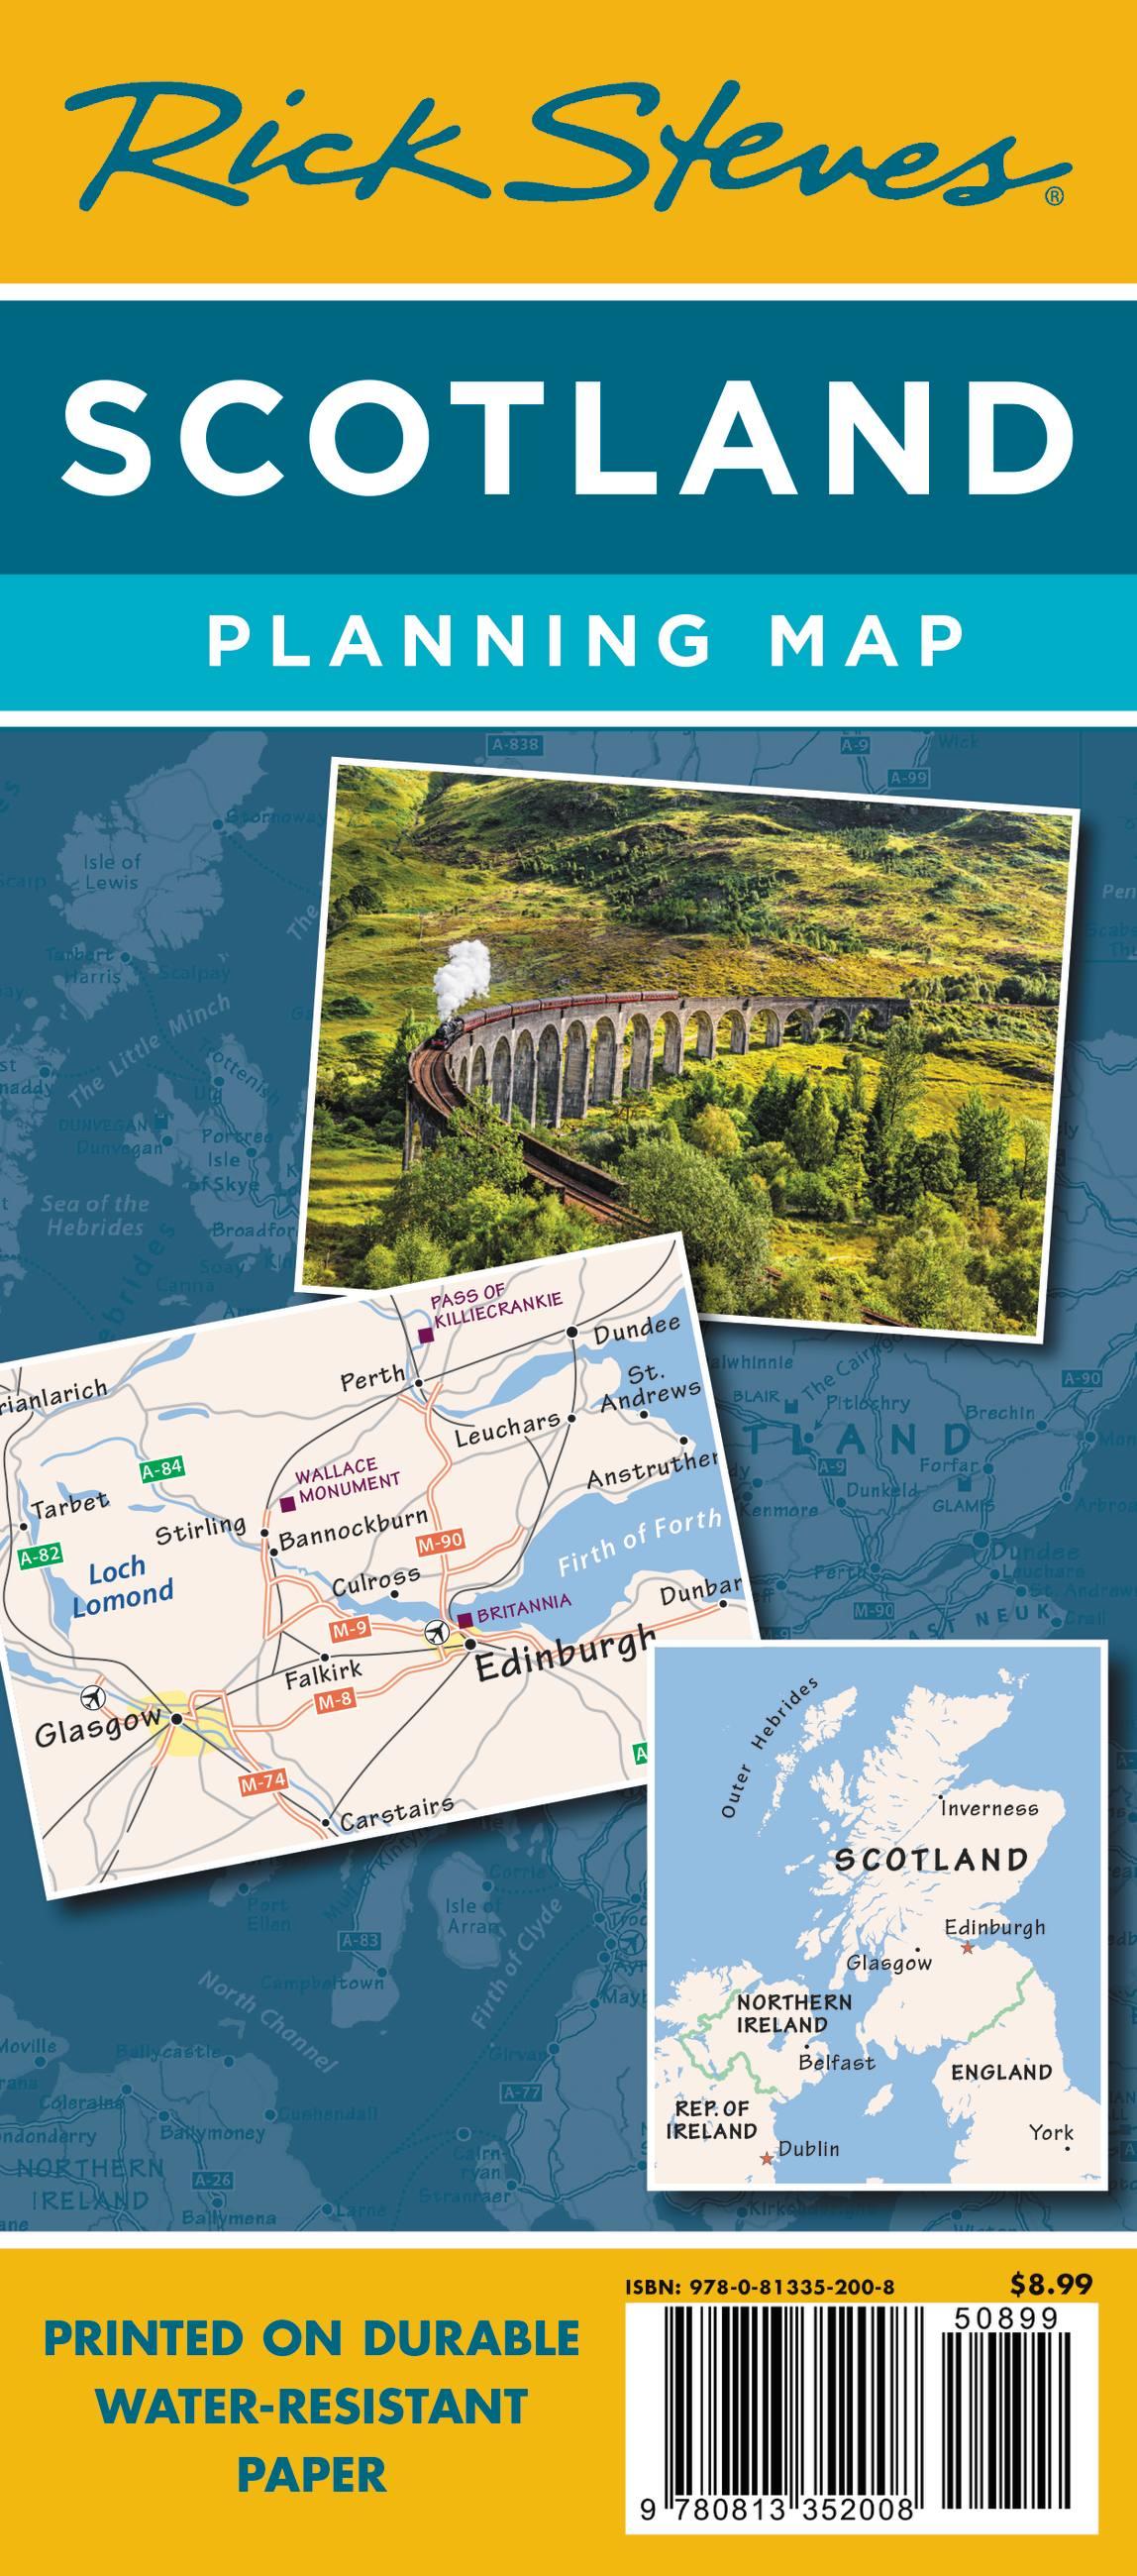 Rick Steves Scotland Planning Map by Rick Steves ...